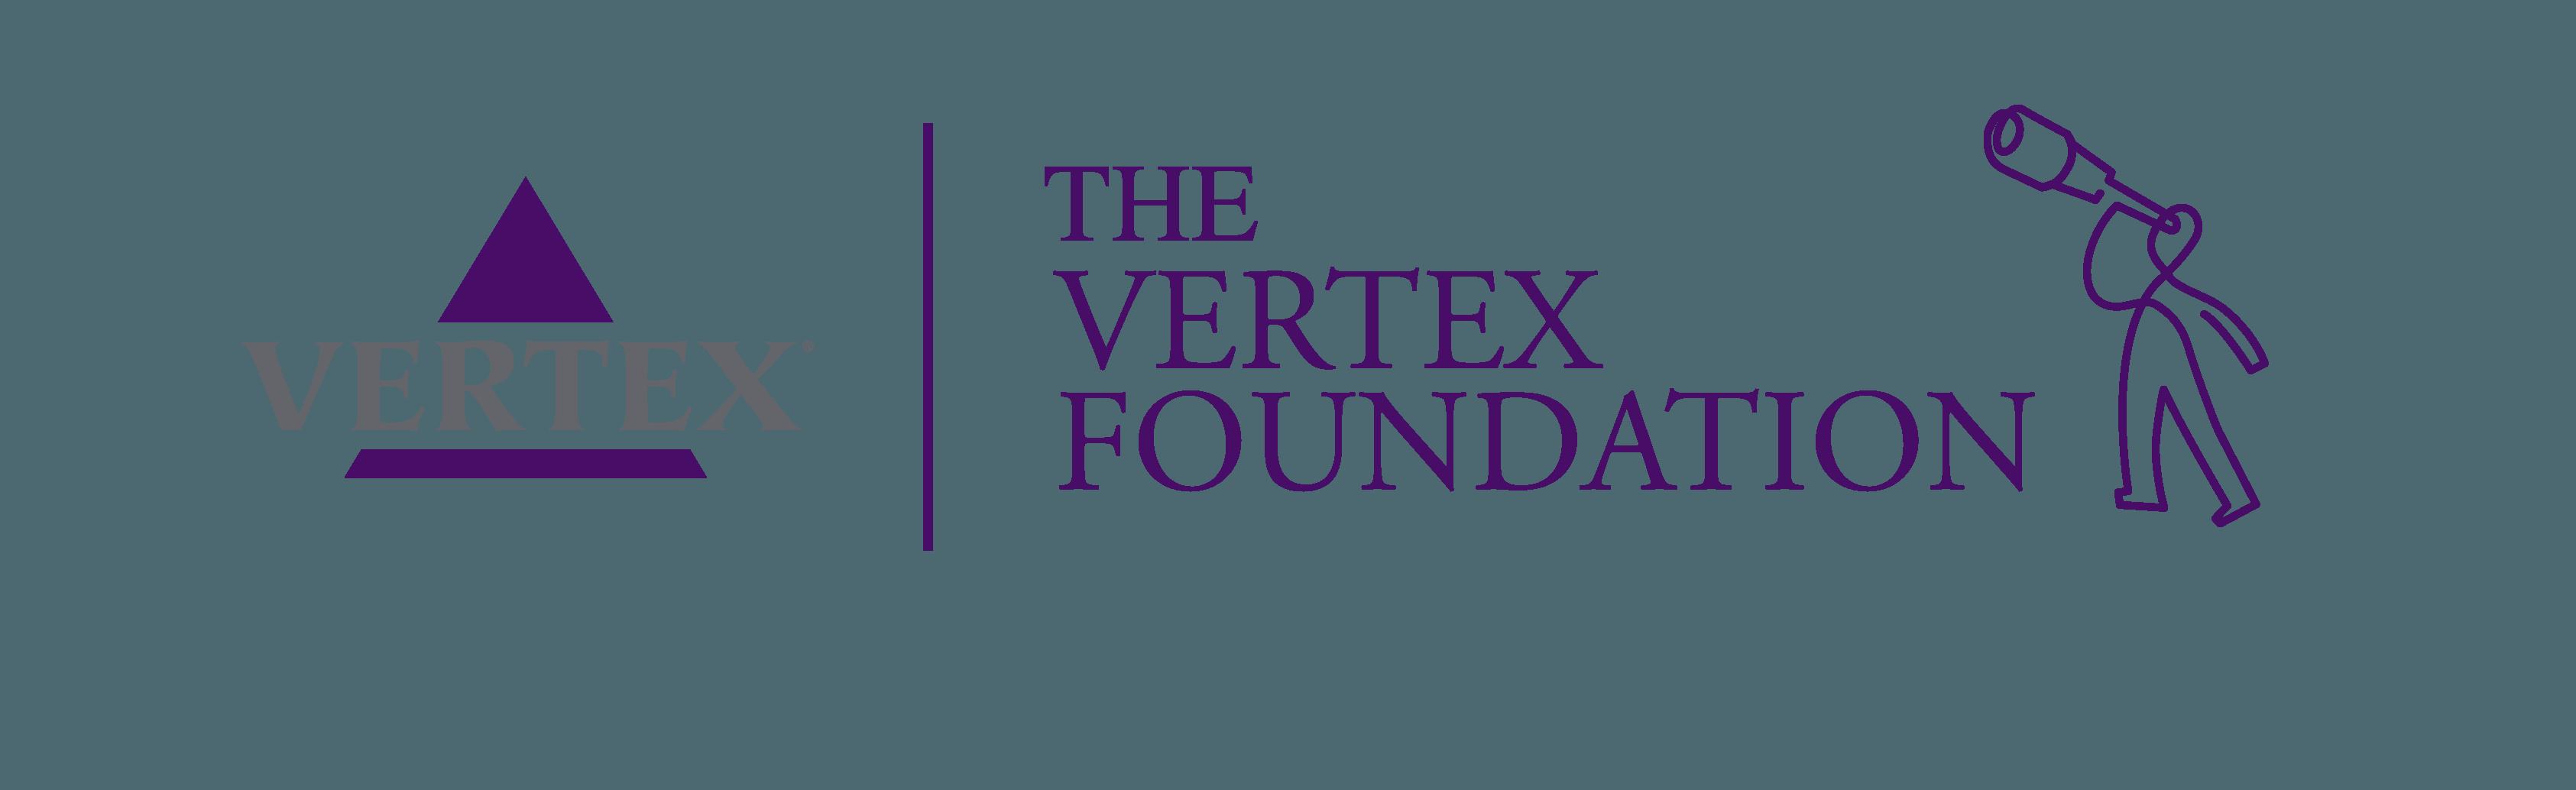 Vertex Foundation logo color